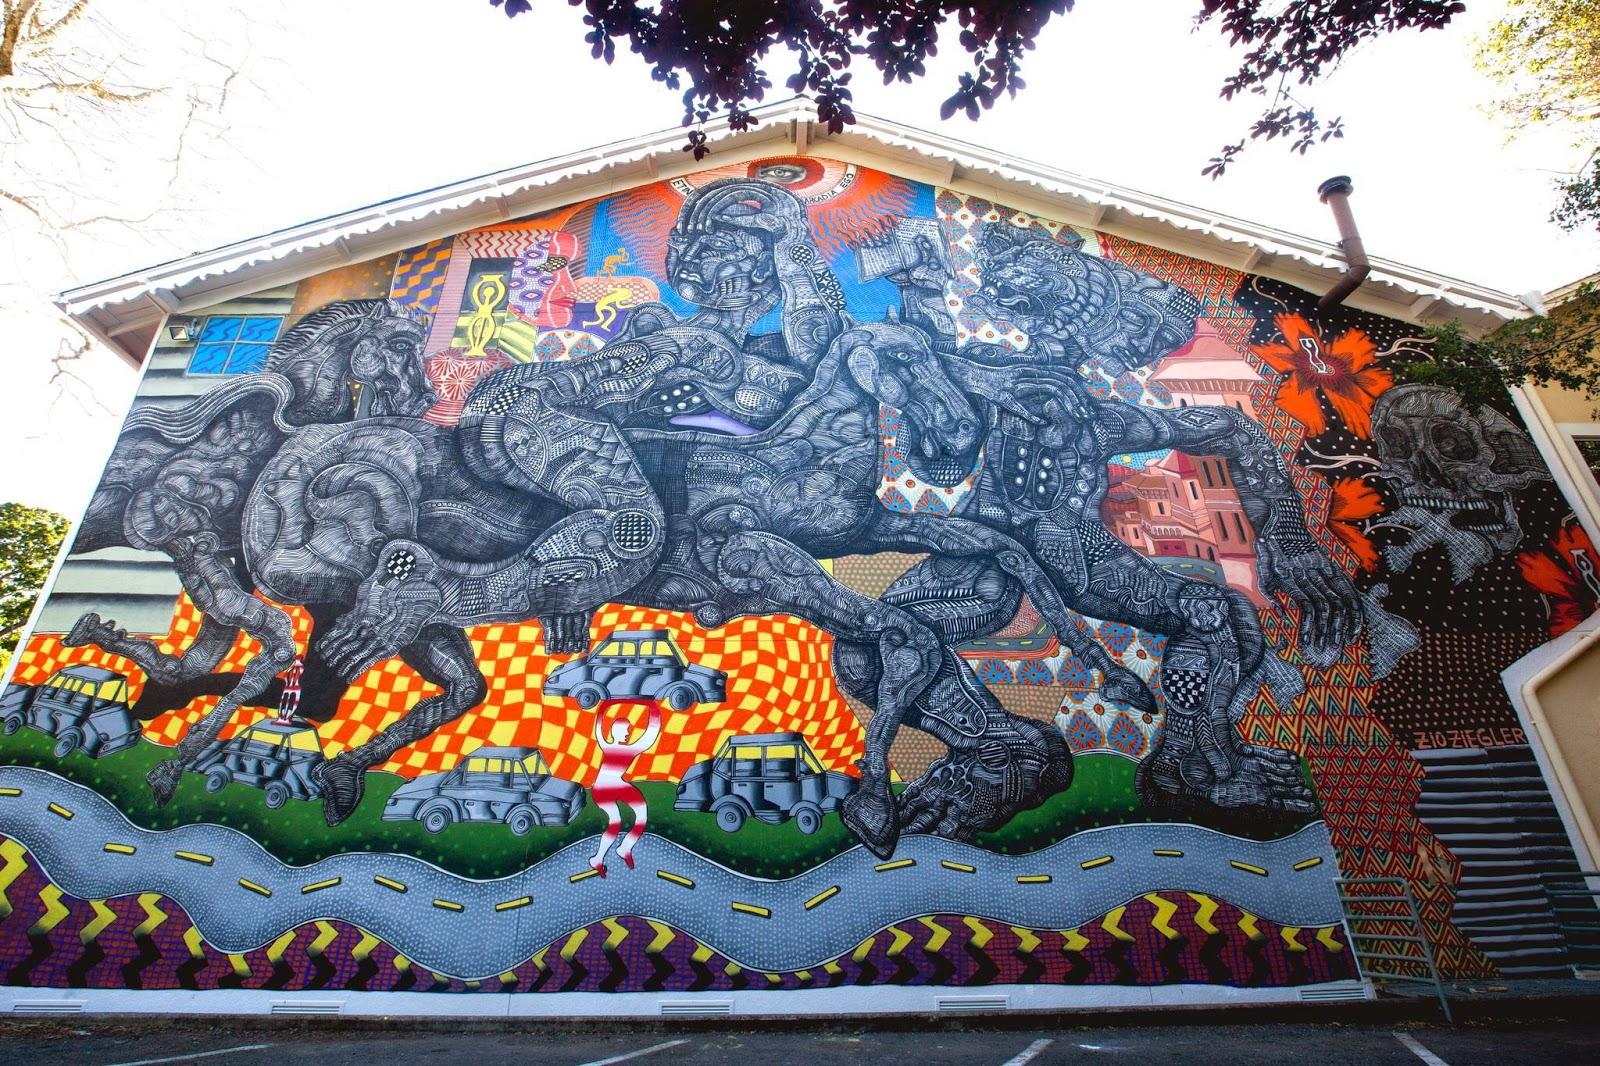 Zio Ziegler creates a new mural in Ross, California ...